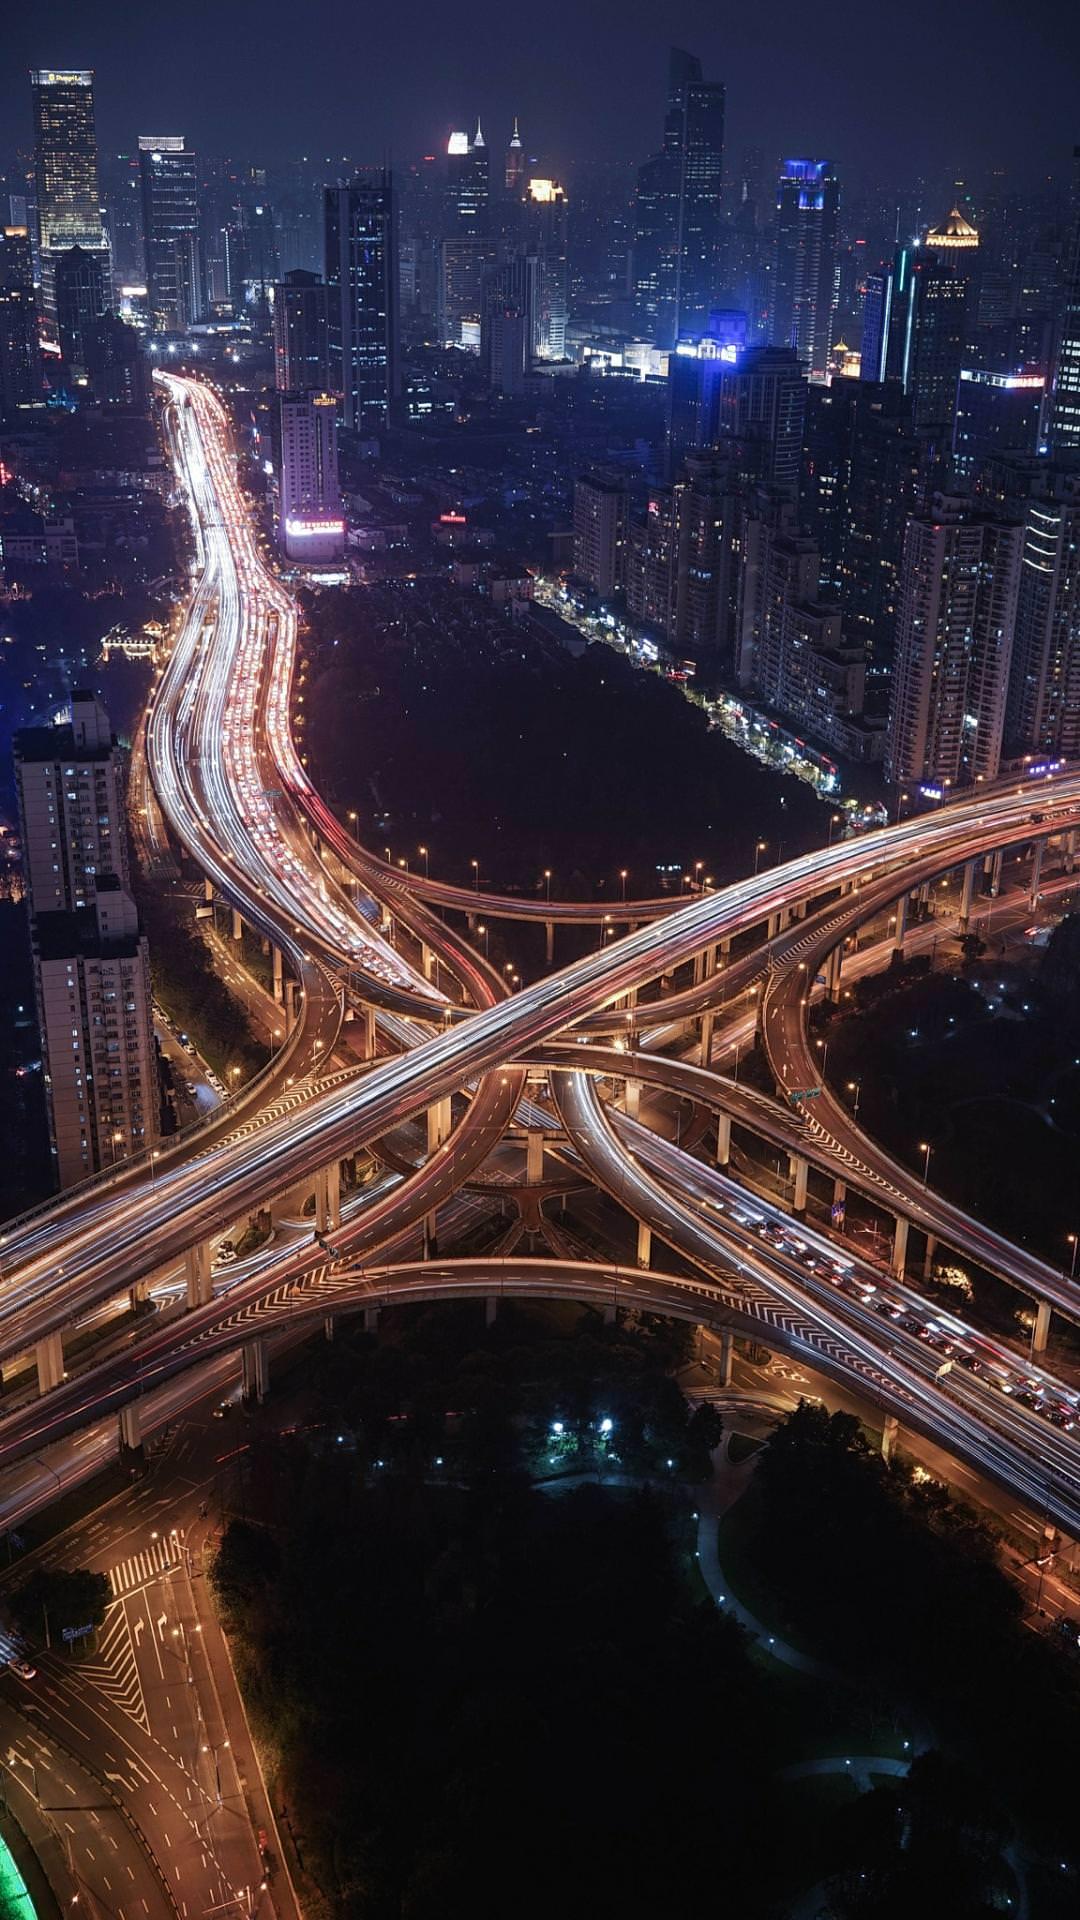 highway road traffic evening travel city bridge light blur dusk motion